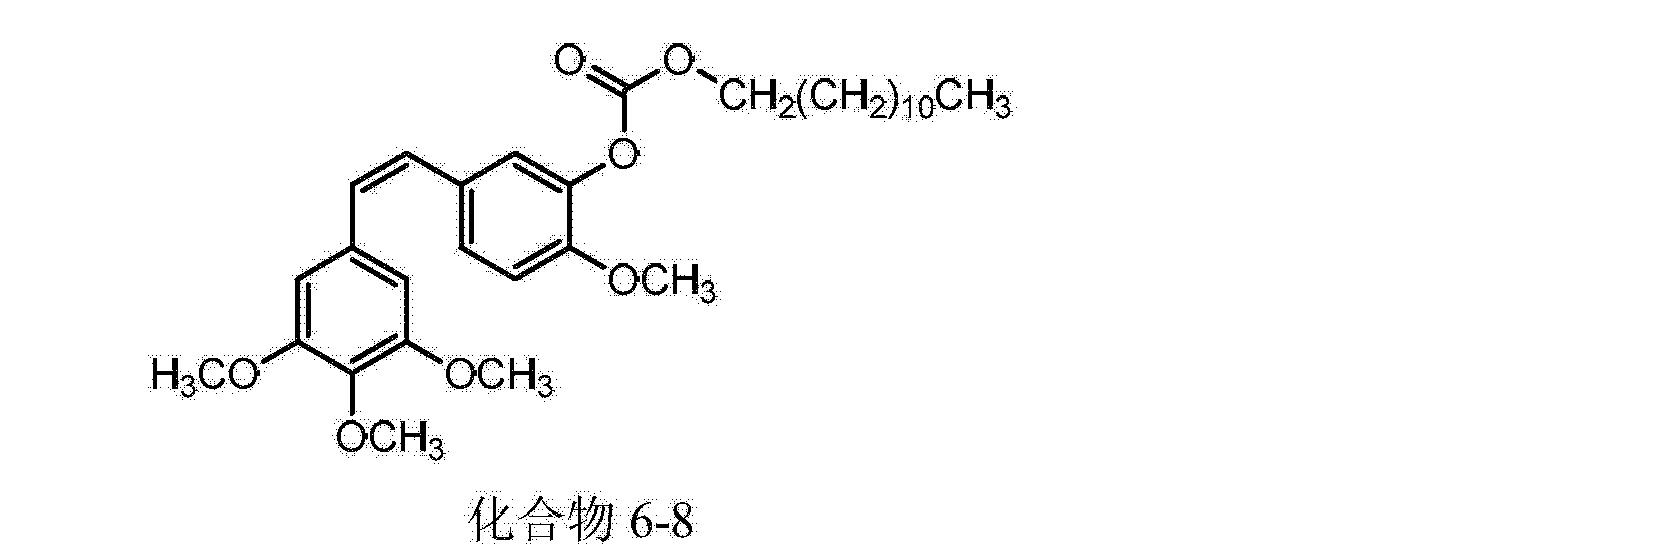 Figure CN103524349AD00131